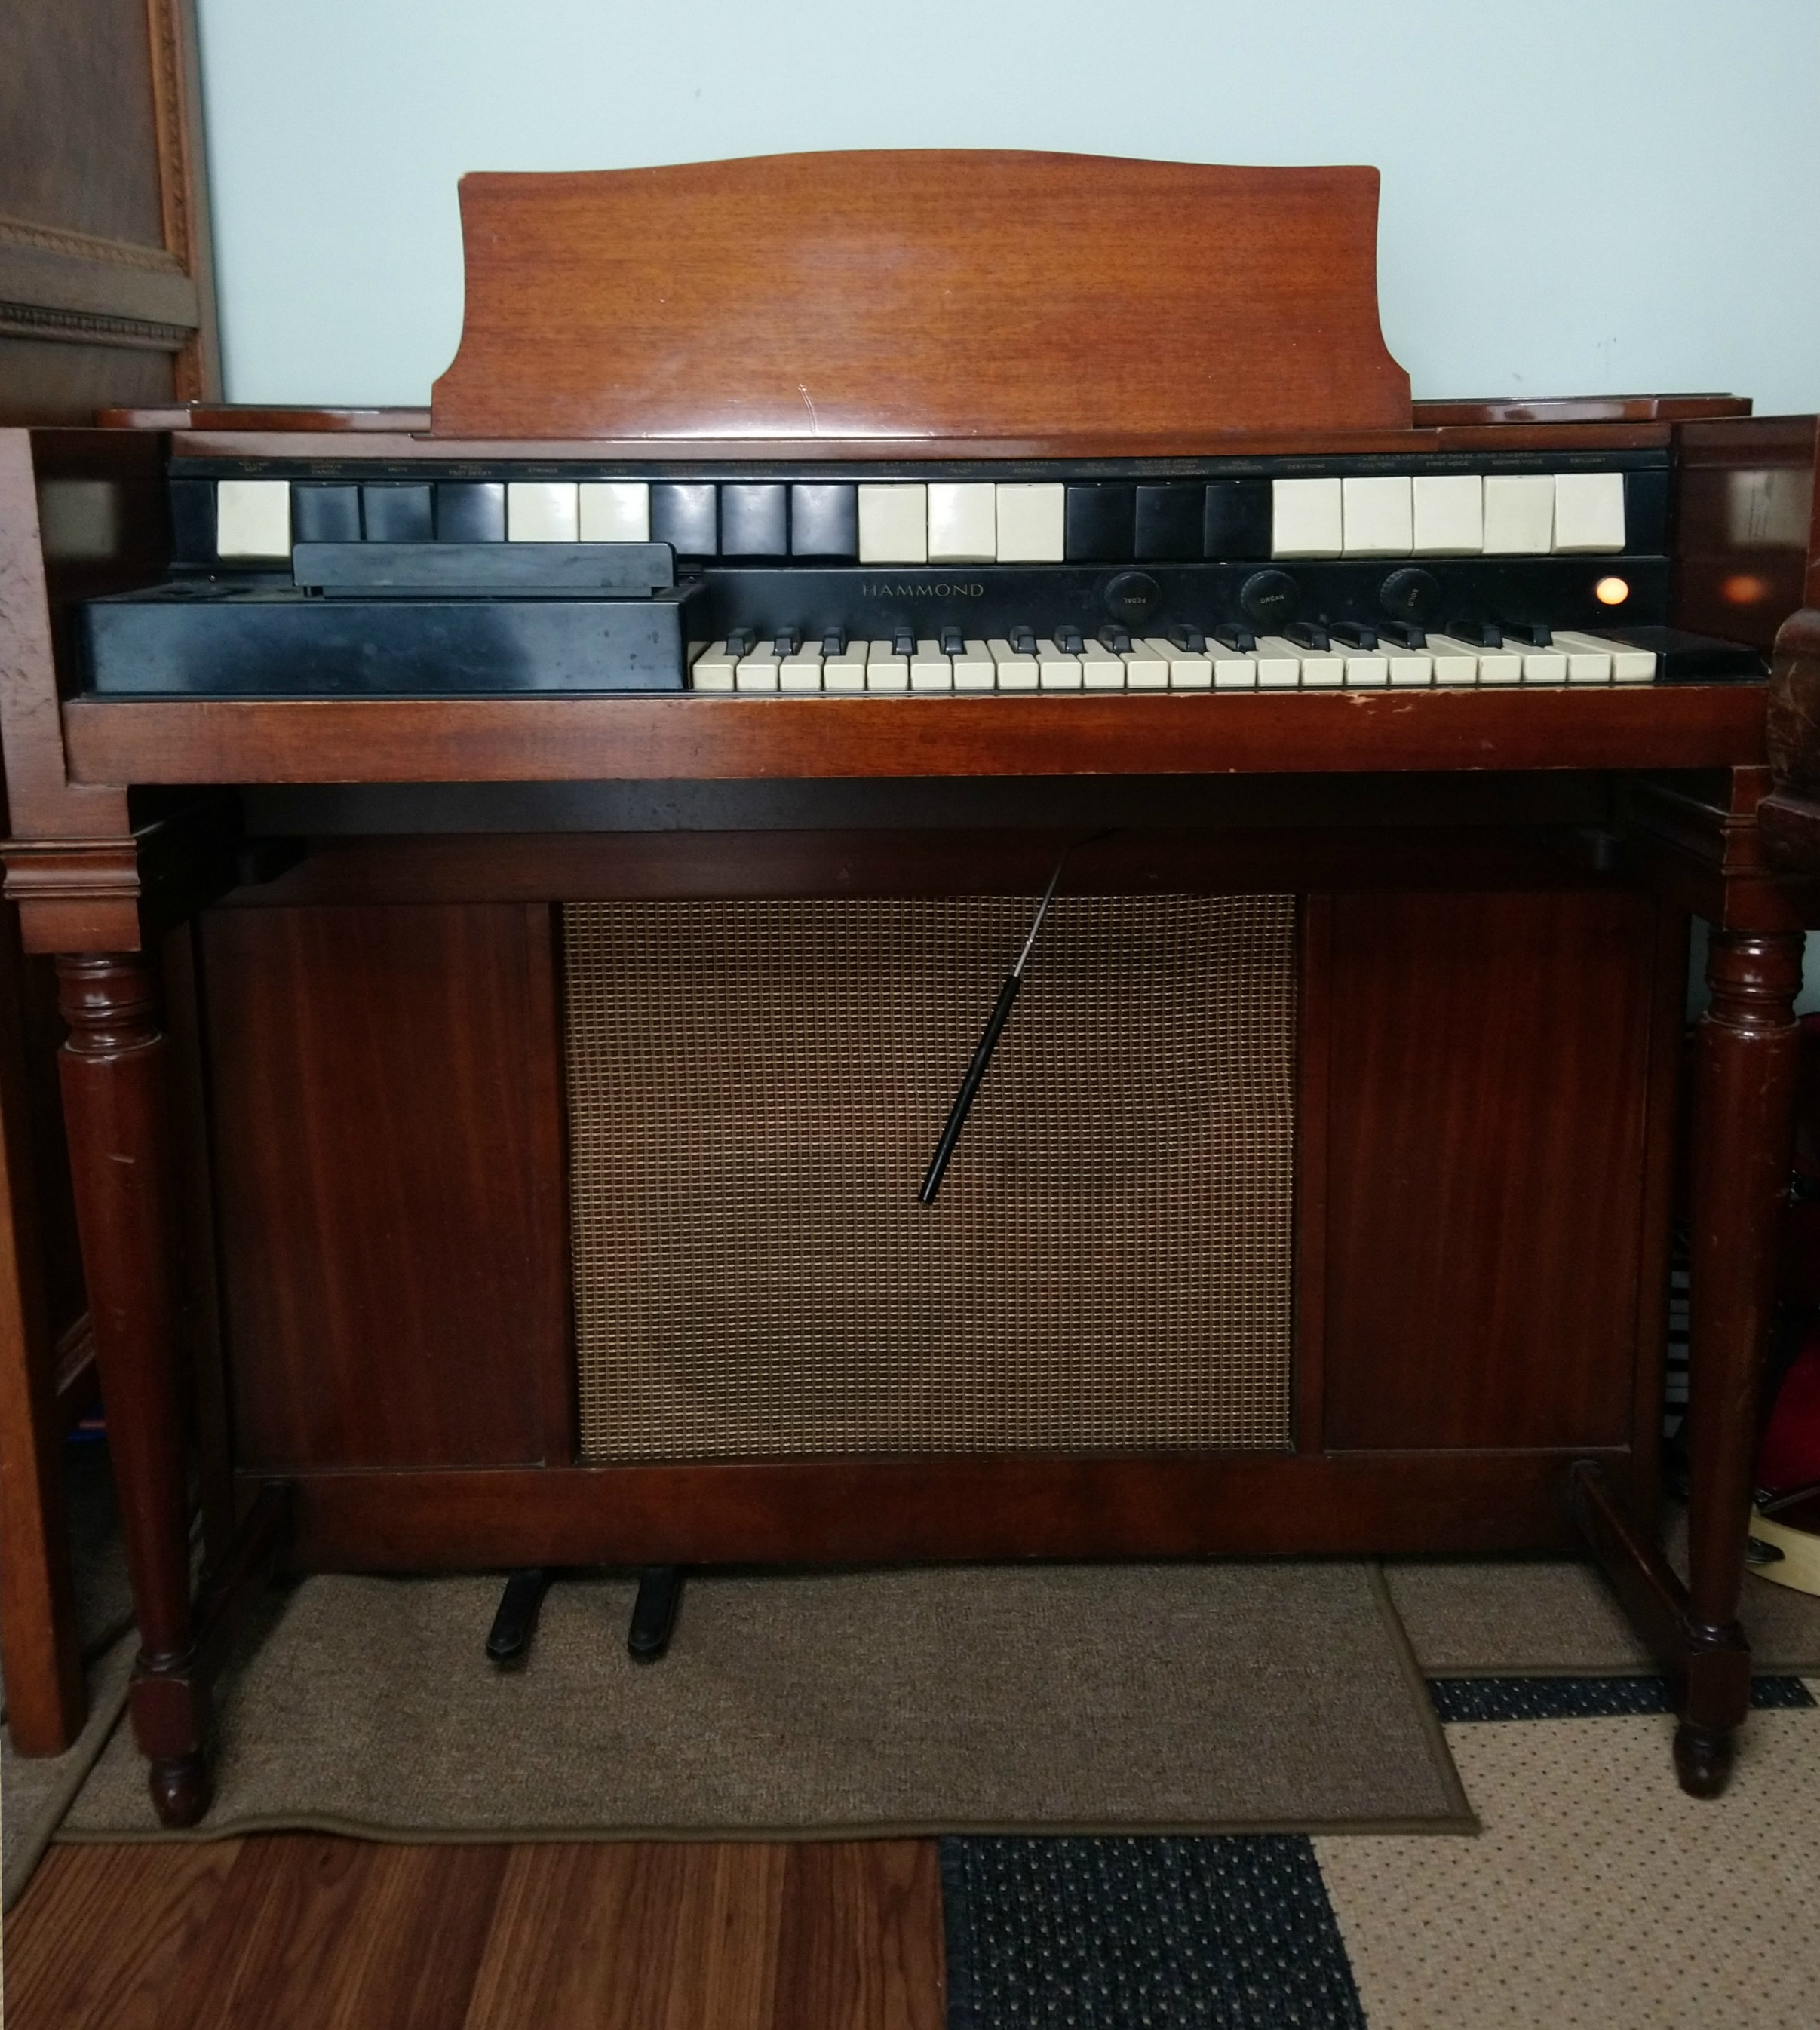 Hammond S6 Chord Organ (1958) -